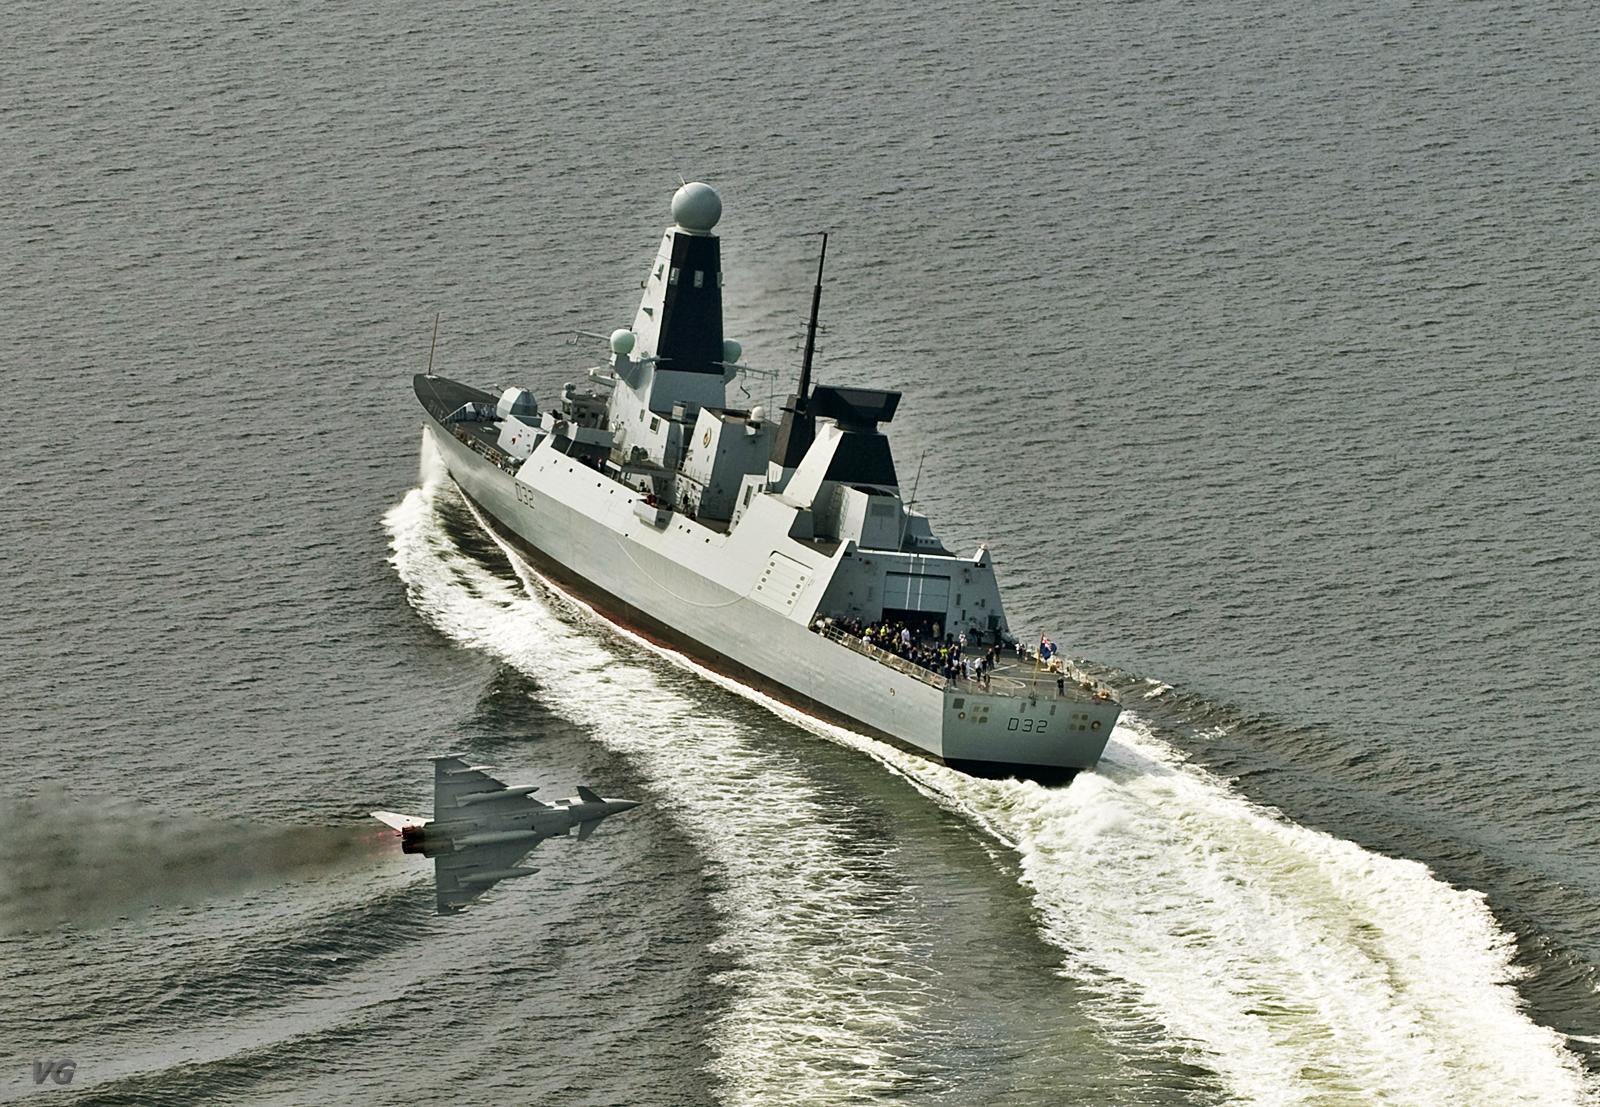 HMS Daring em treinamento com caça Typhoon - foto MoD UK